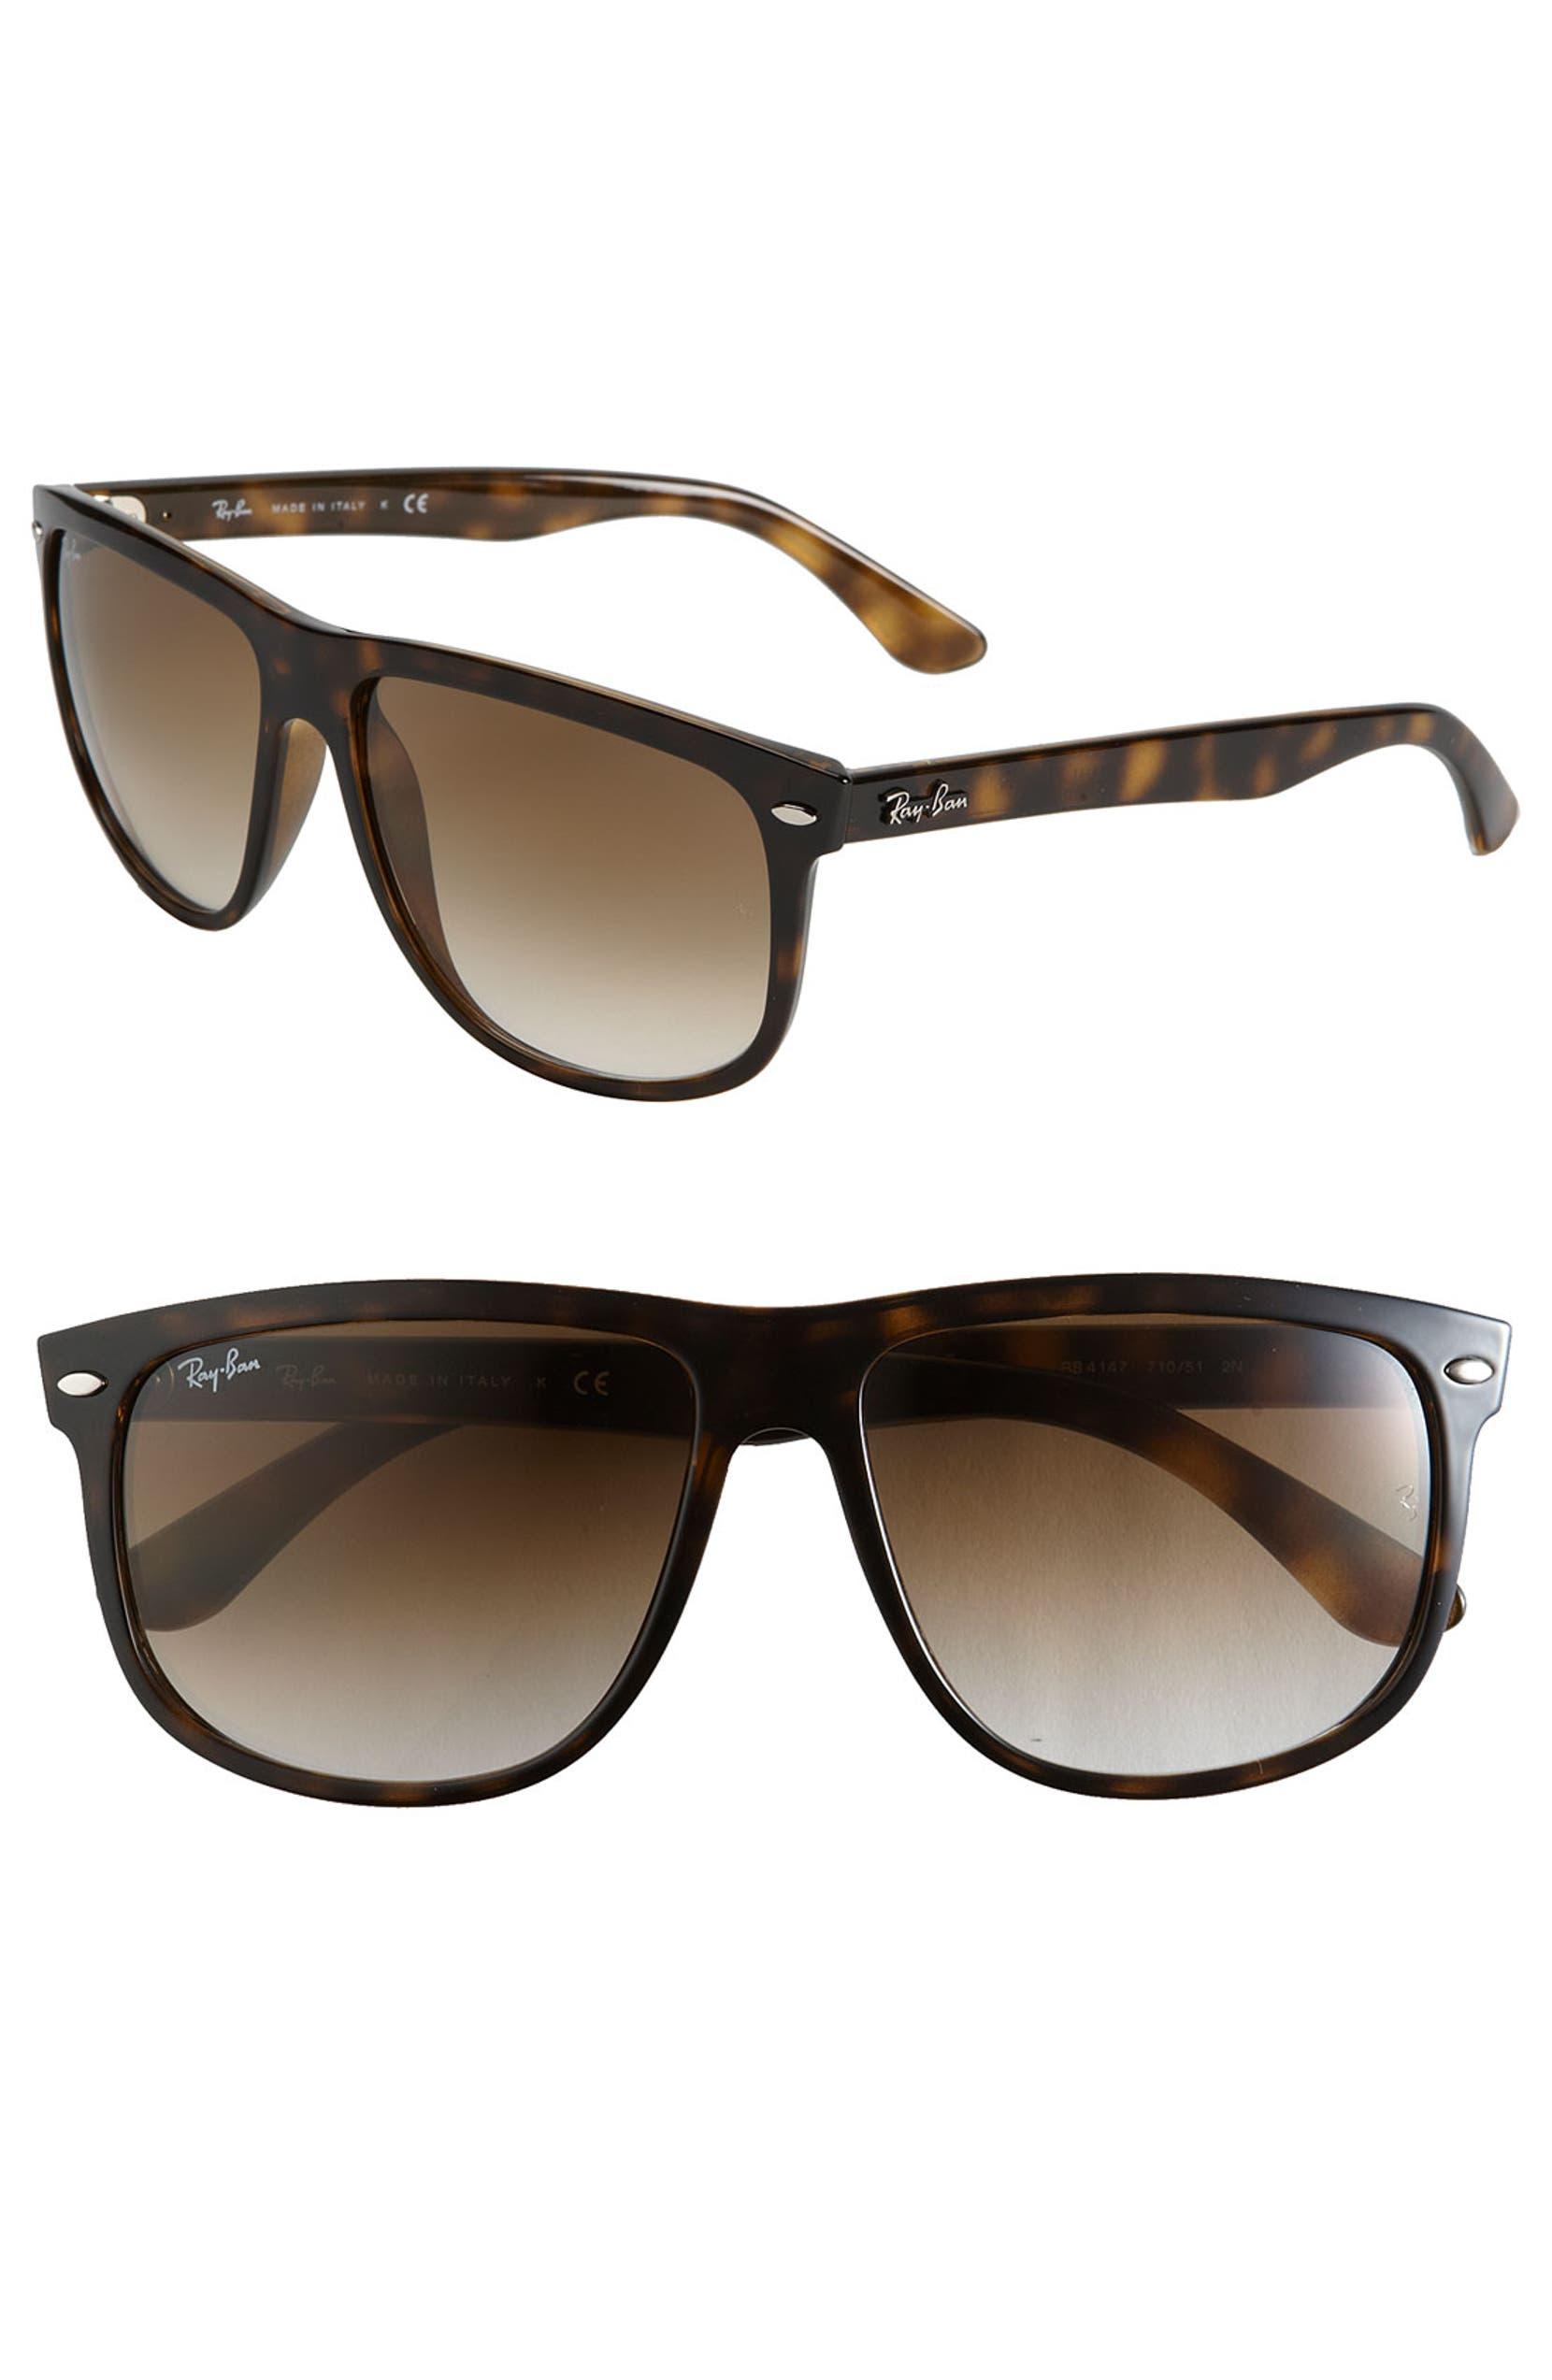 188747bb2c Ray-Ban Boyfriend 60mm Flat Top Sunglasses